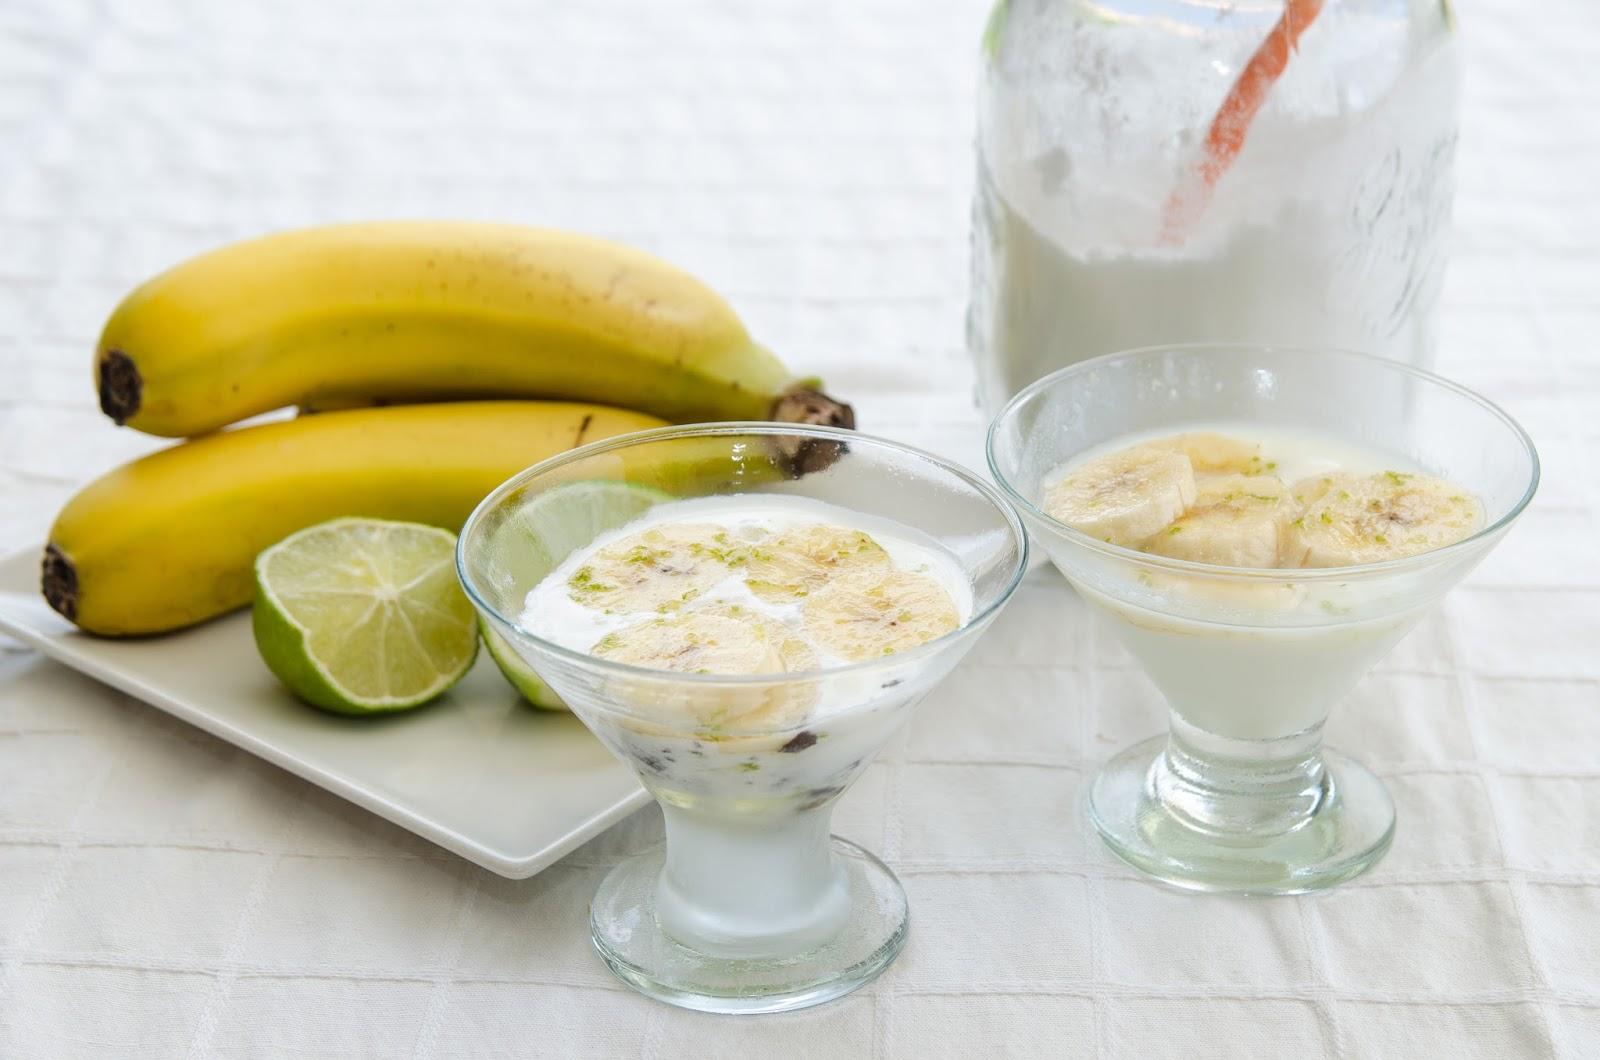 receta-postre-sana-saludable-cocina-adelgazar-casera-platano-almibar-lima-helado-yogur-bruja